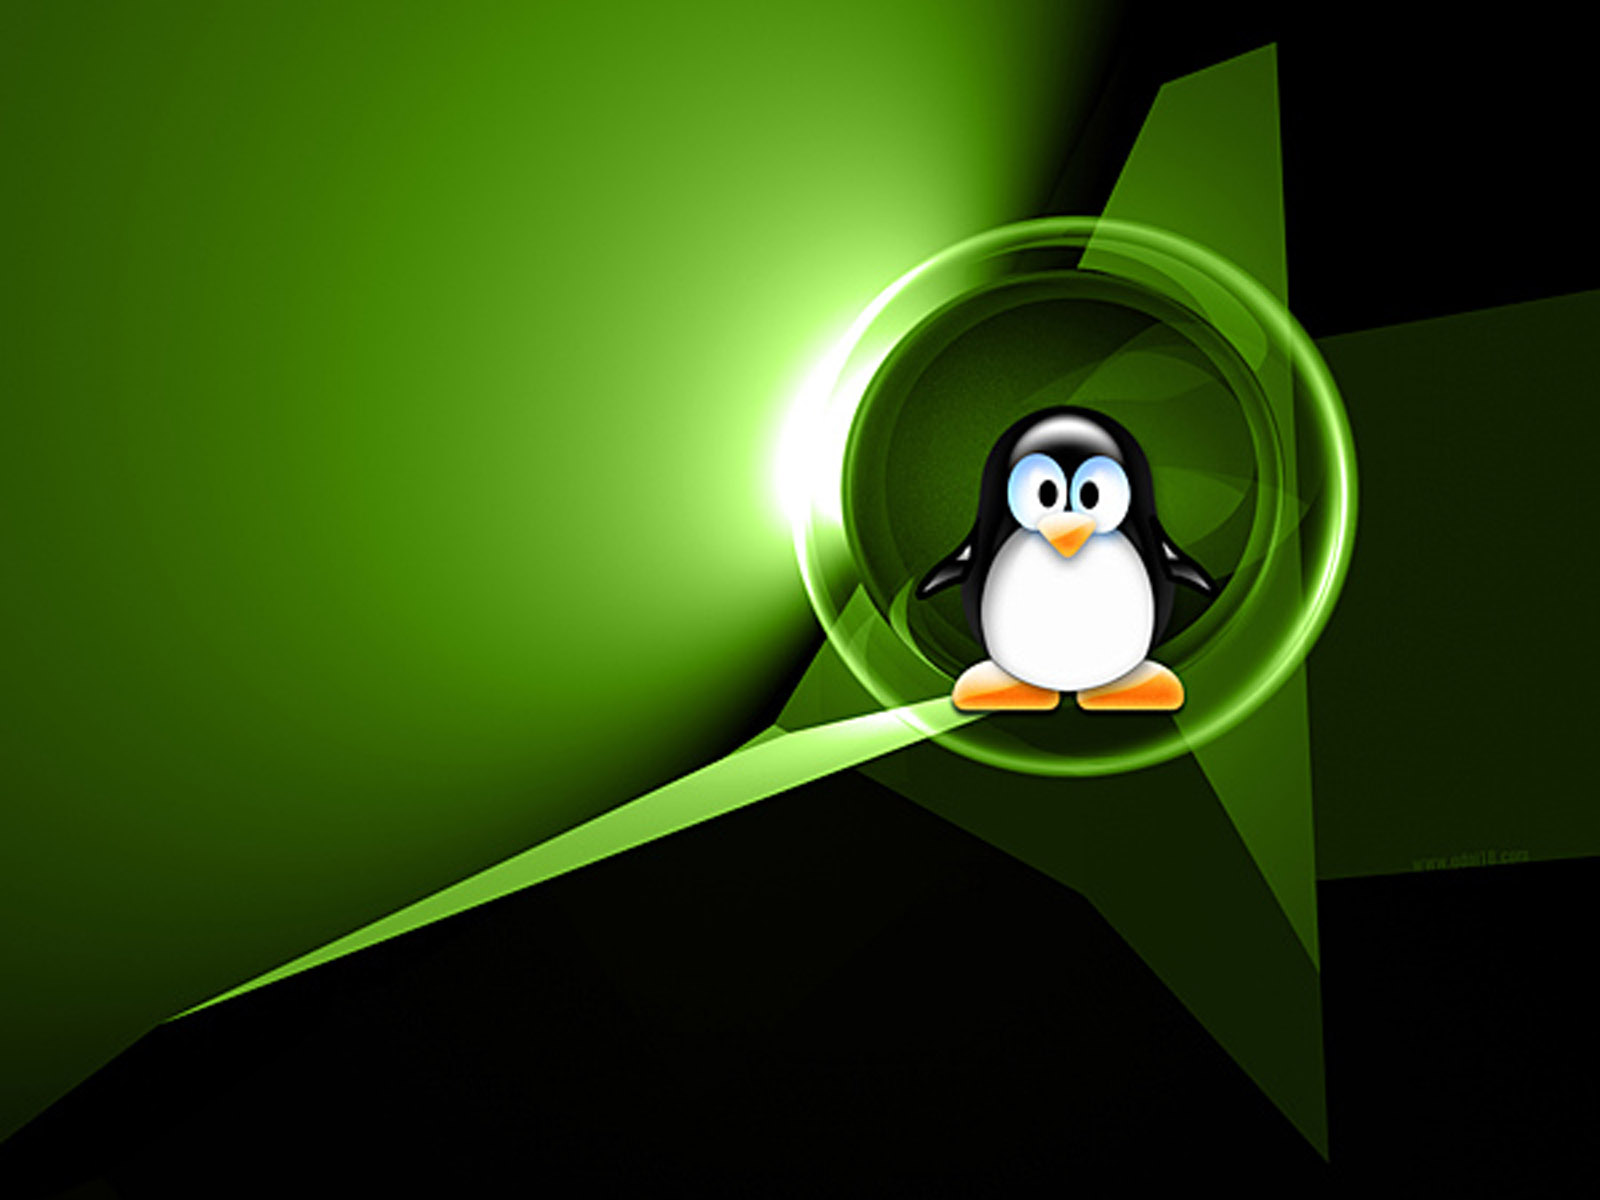 Desktop Backgrounds Linux Desktop Wallpaper 1600x1200